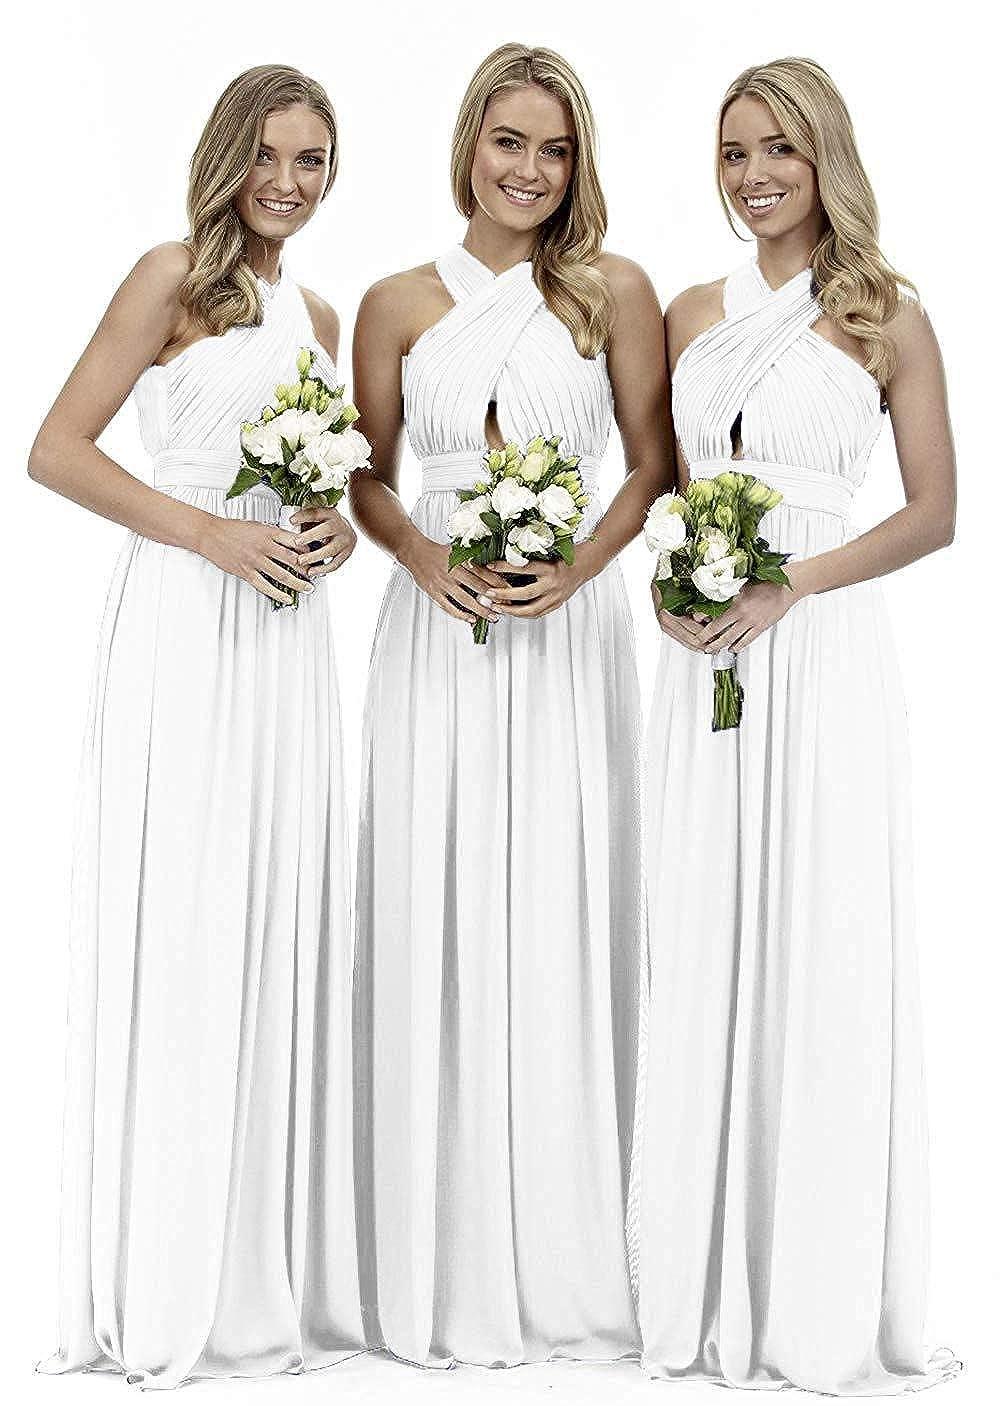 White liangjinsmkj Womens Knee Length V Neck Lace Mother of The Bride Dress A line with